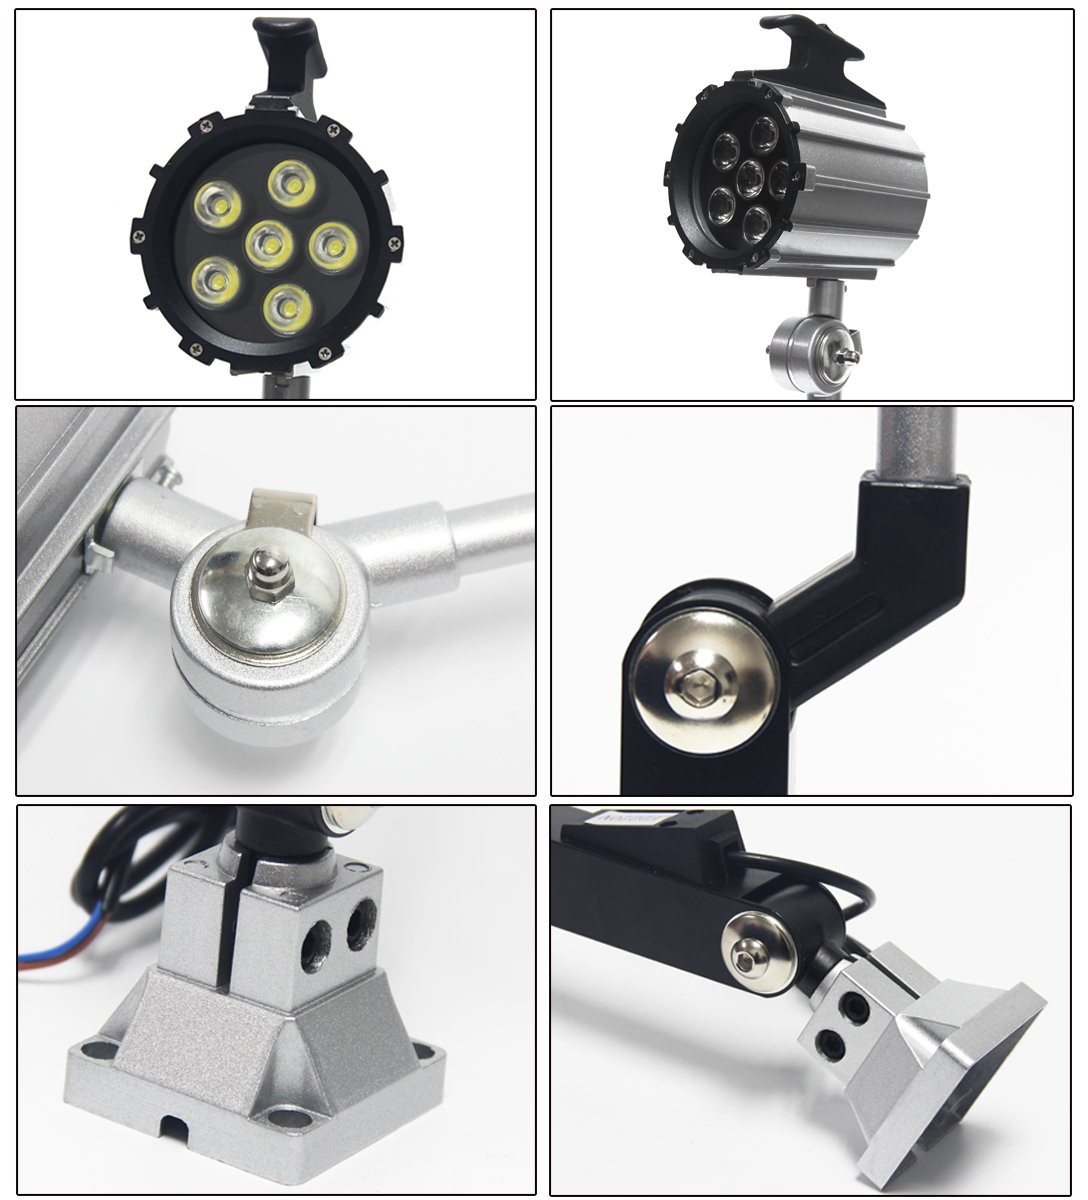 Wisamic LED Work Light for Lathe, CNC Milling Machine, Drilling Machine, Aluminum Alloy, 12W 110V-220V, Adjustable Multipurpose Worklight, Long Arm by WISAMIC (Image #3)